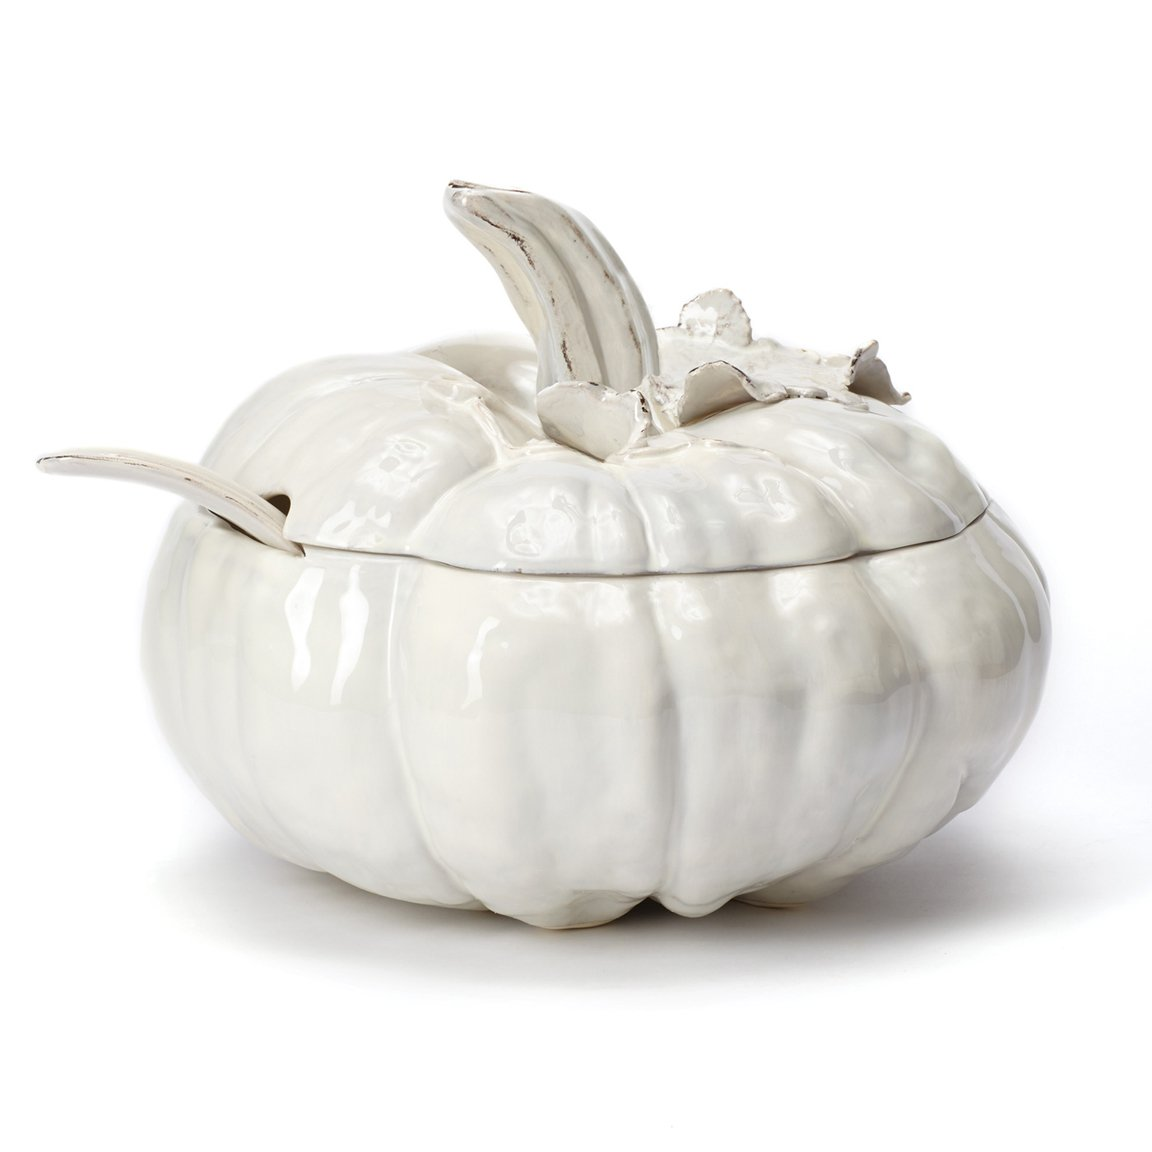 Vietri Natura Pumpkin Soup Tureen with Ladle   B010O19WNK